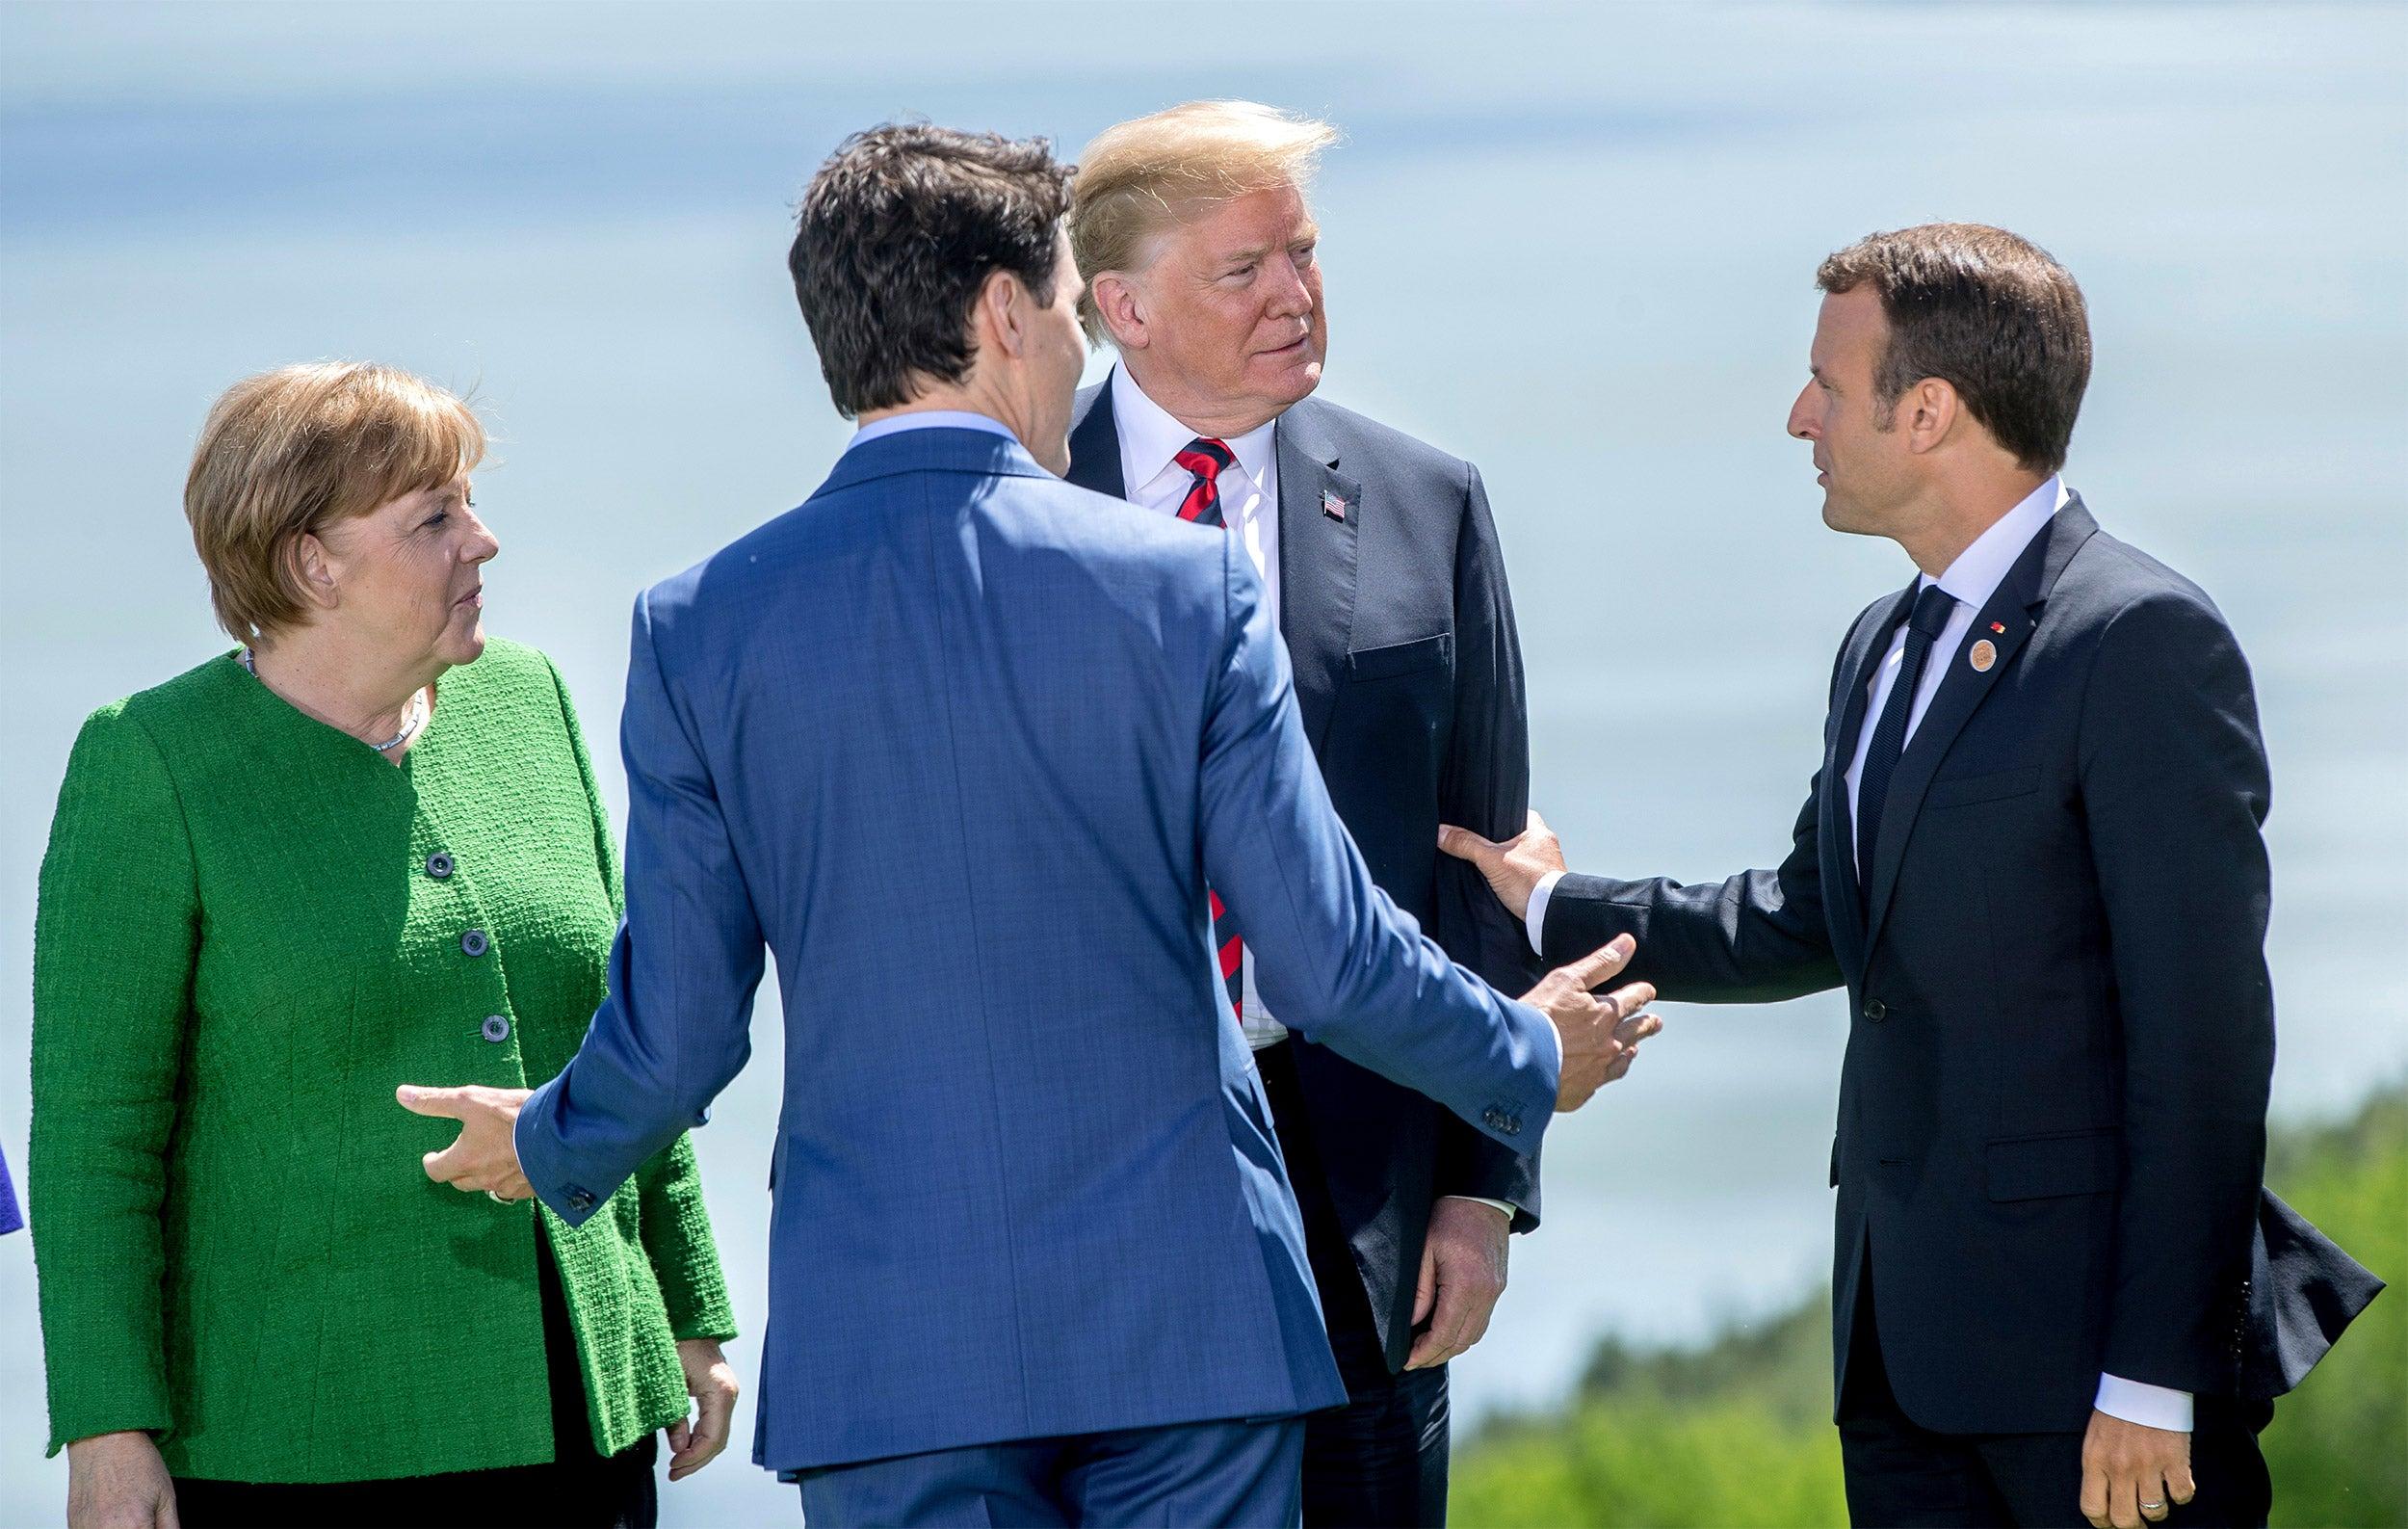 Angela Merkel, Justin Trudeau, Donald Trump, and Emmanuel Macron at the G7 summit.